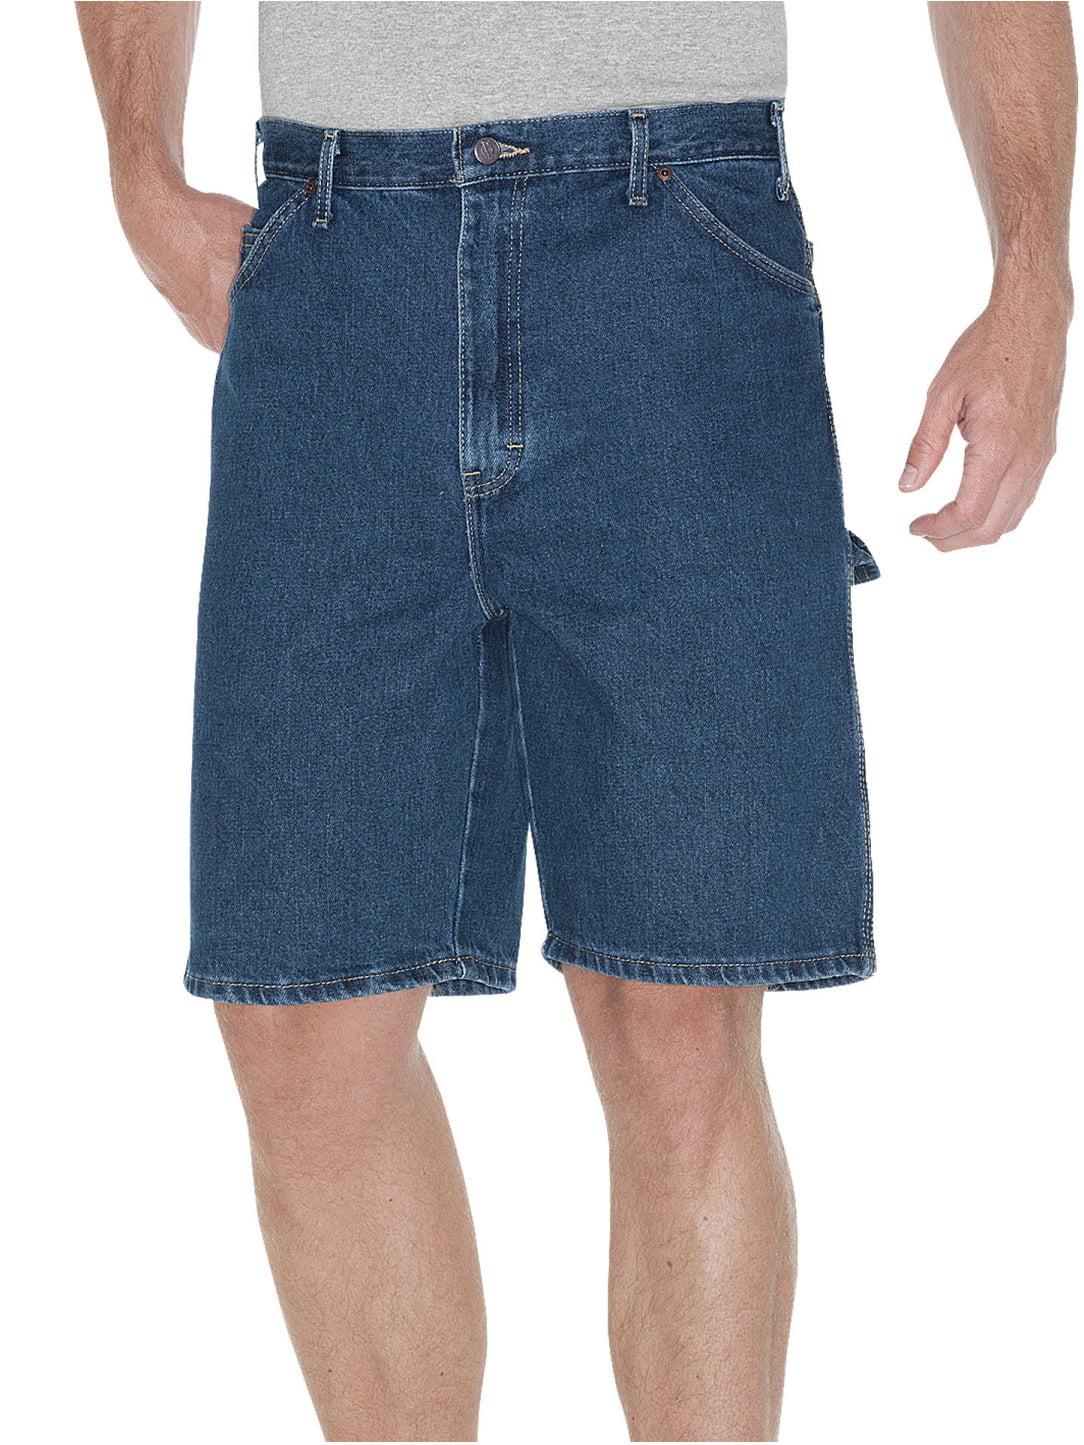 "Big Men's 9.5"" Denim Carpenter Short"